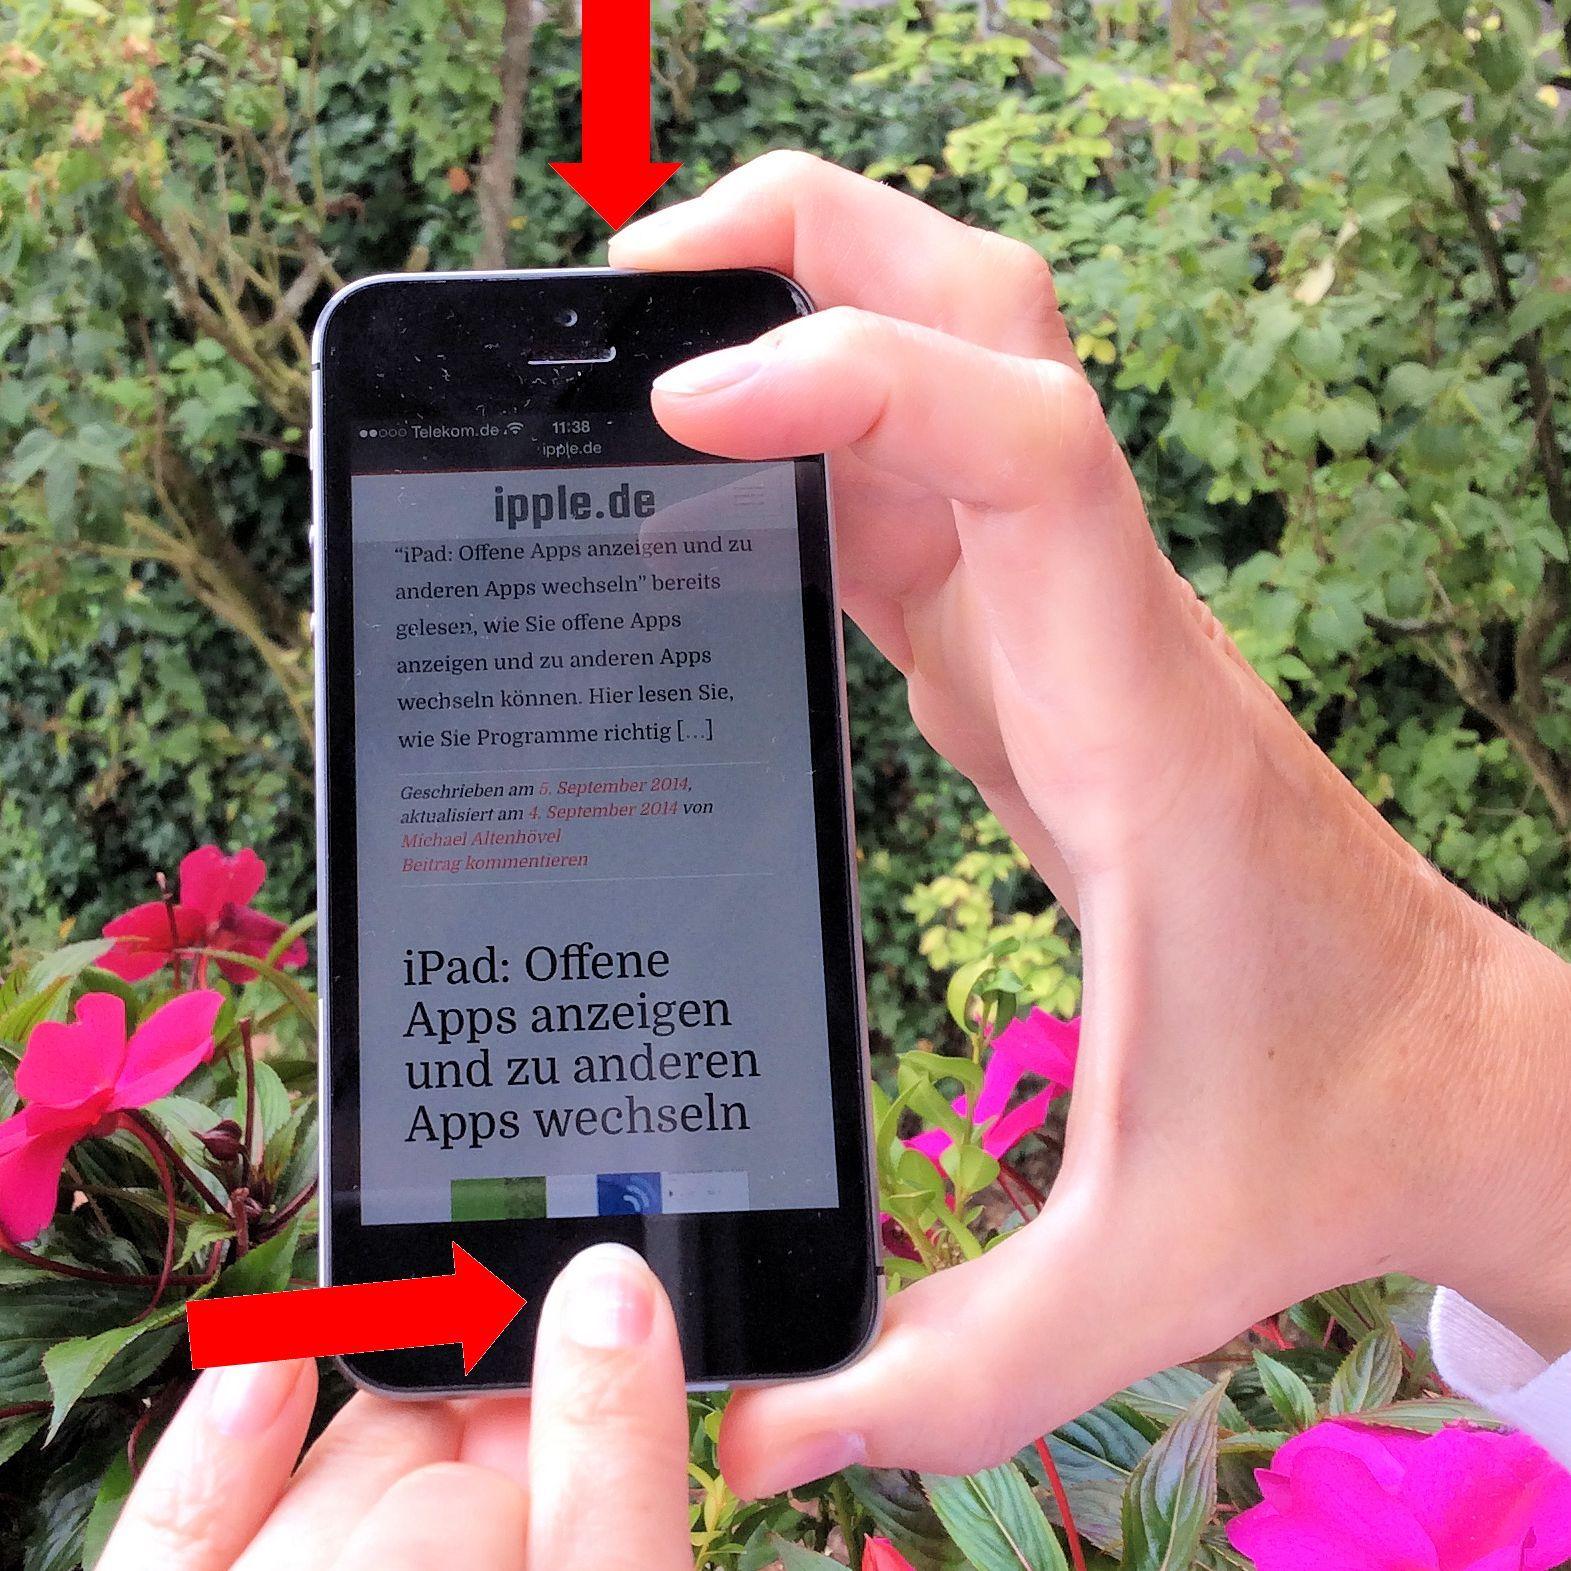 iPhone abgestürzt aufgehängt Hard Reset Bildschirm dunkel Apple Logo Apfel Handgriff